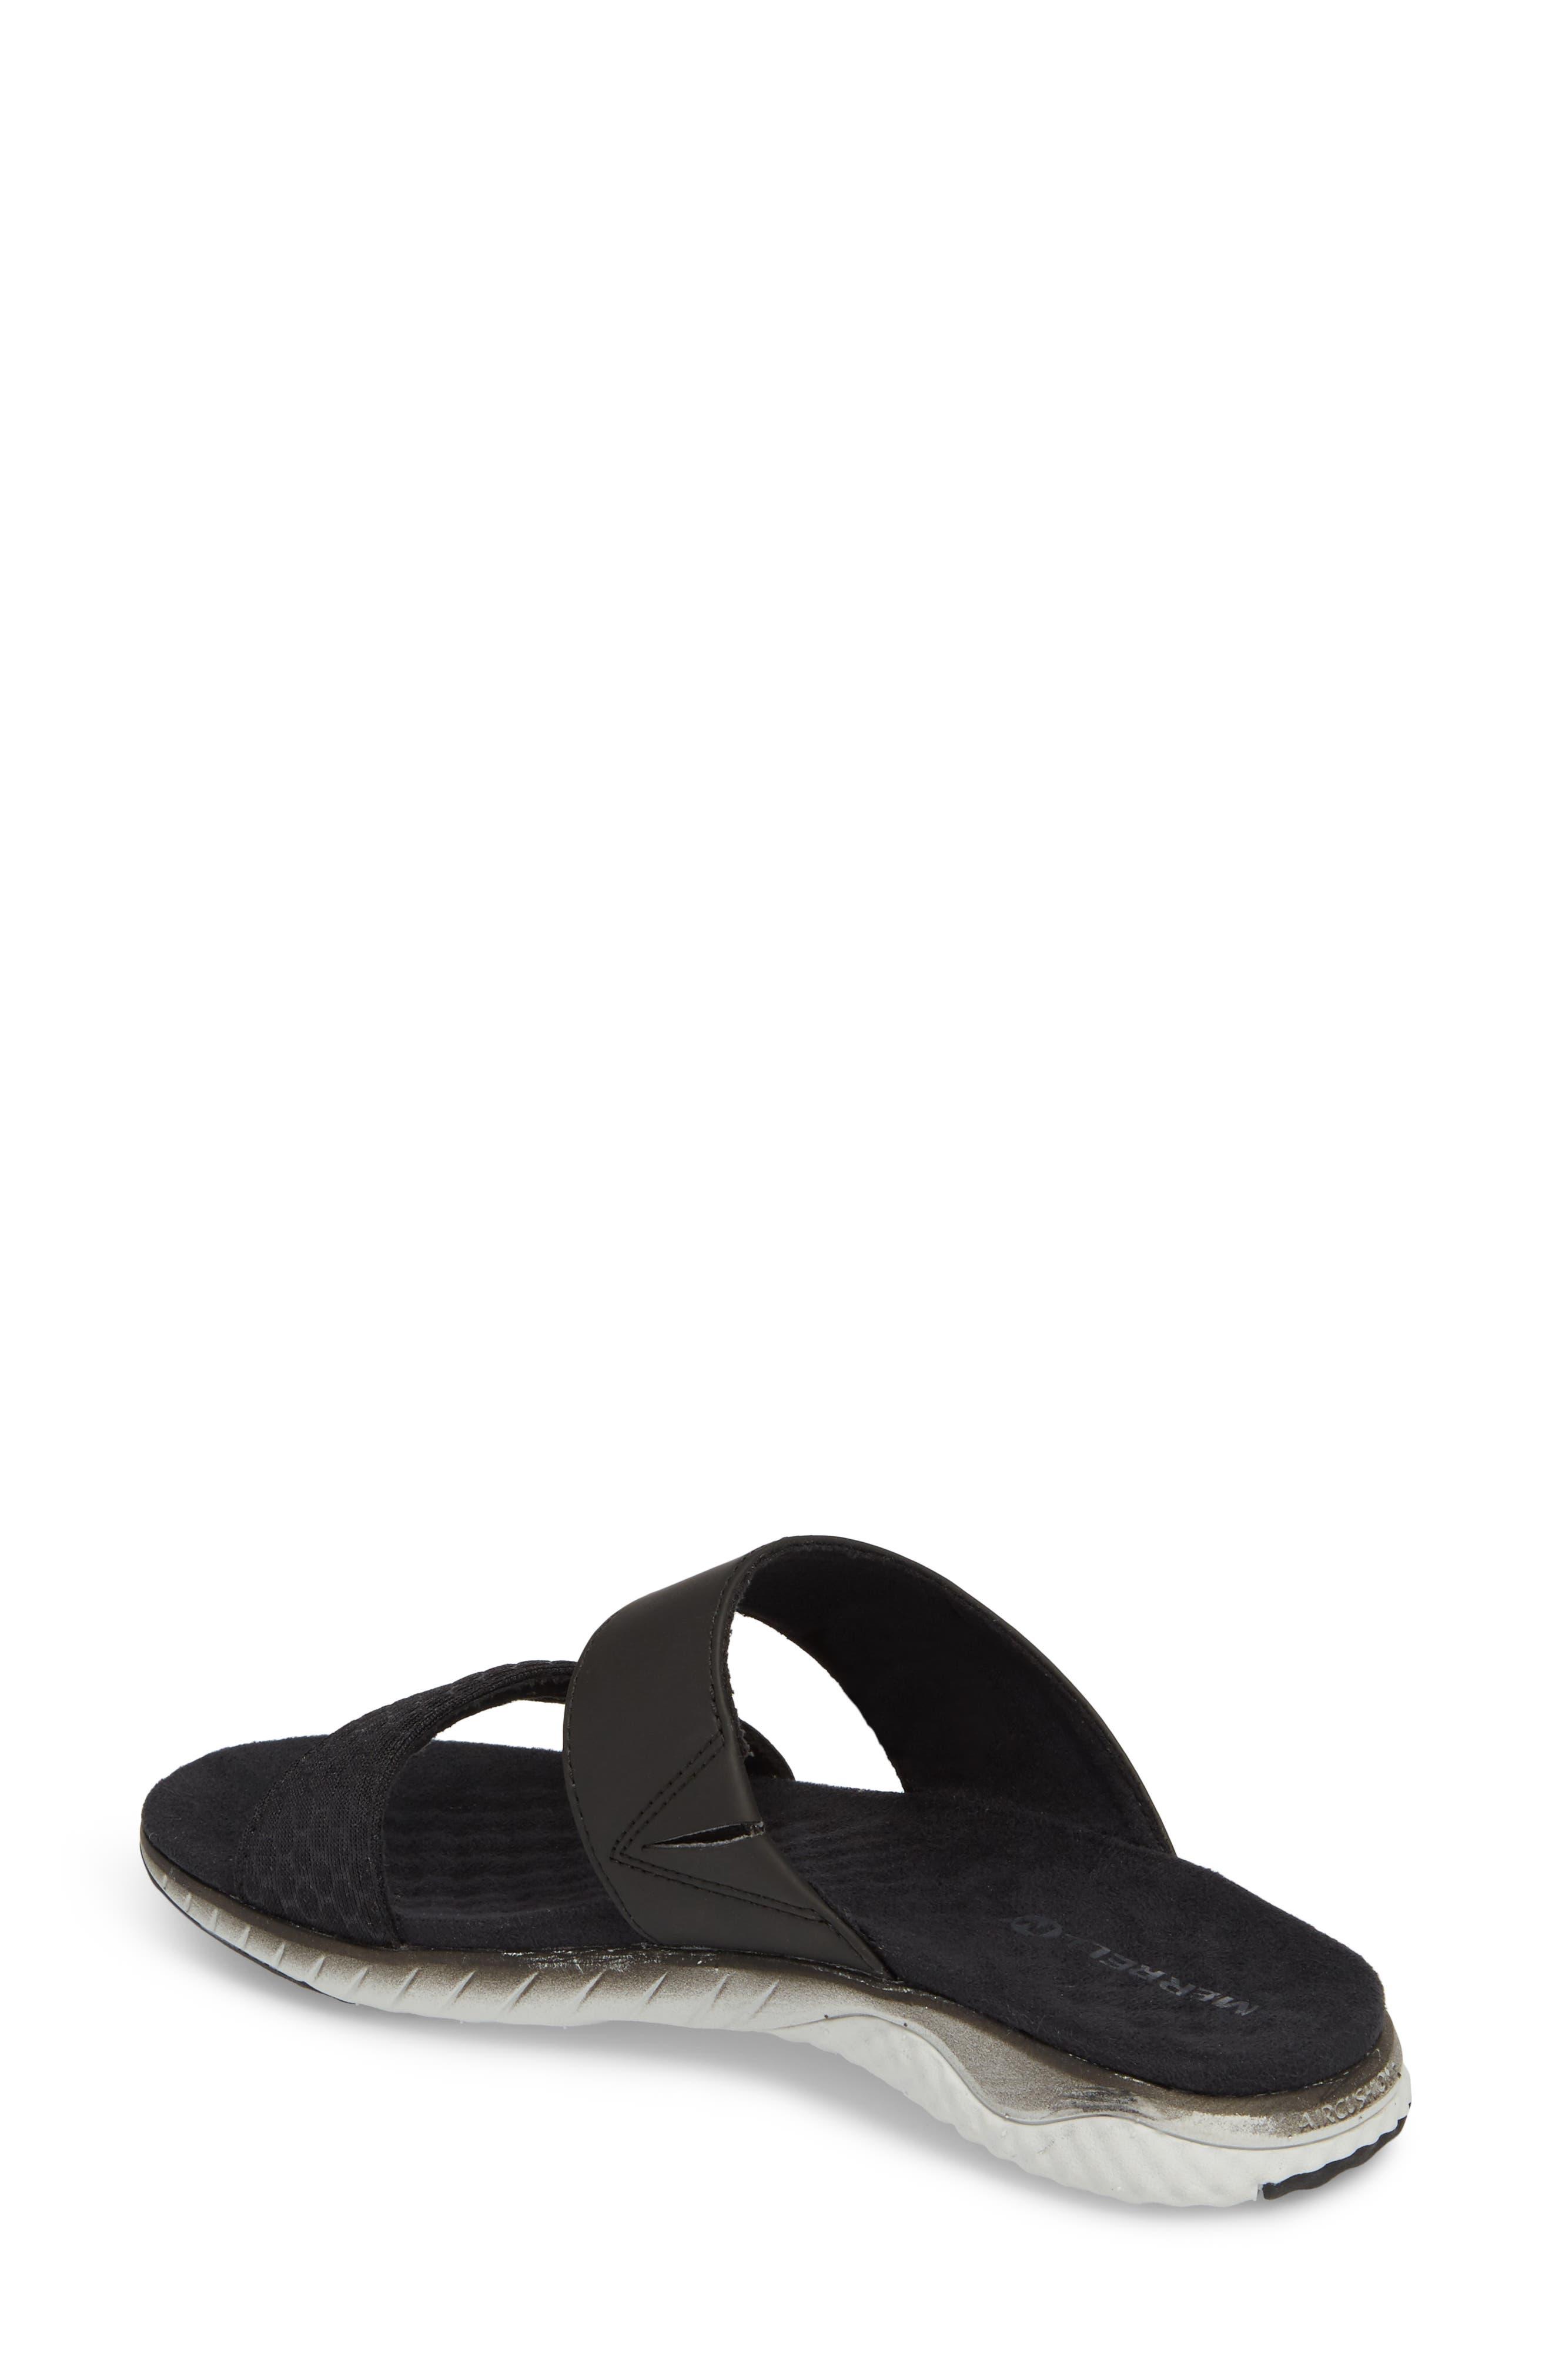 1SIX8 Linna Air Cushion+ Slide Sandal,                             Alternate thumbnail 2, color,                             Black